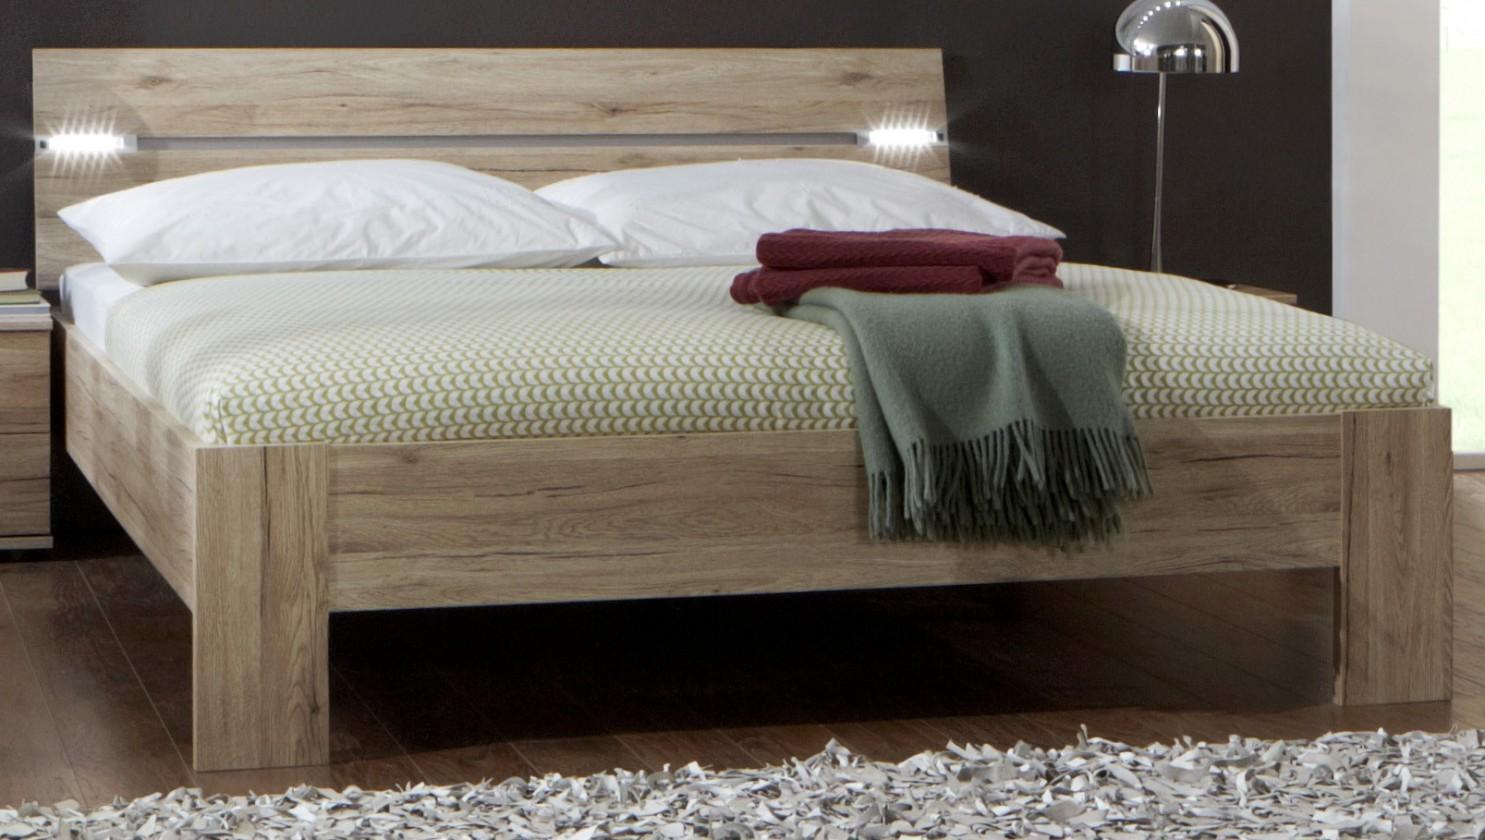 Dřevěná Madrid - Postel 160 cm (dub san remo)